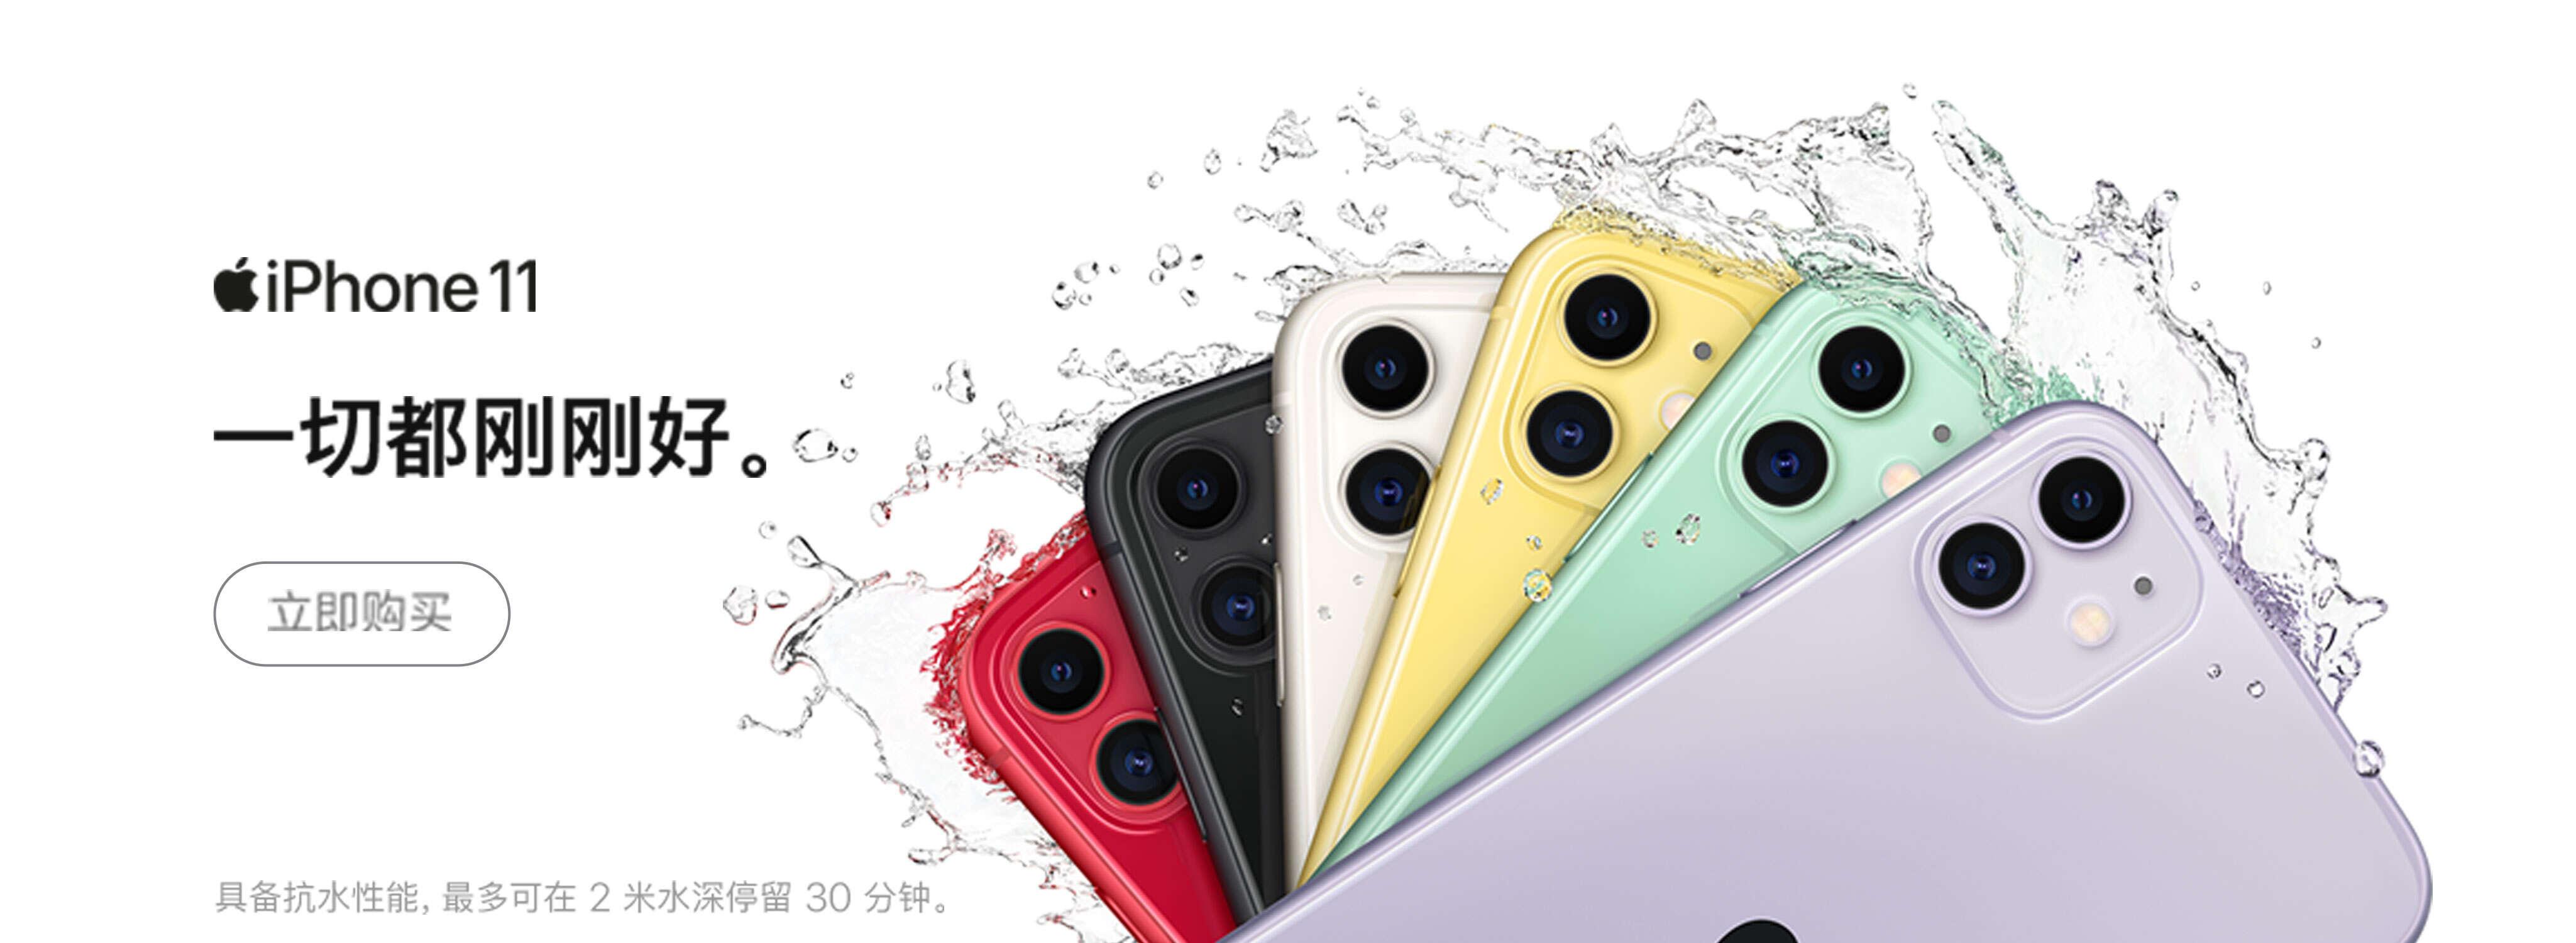 iphone发售